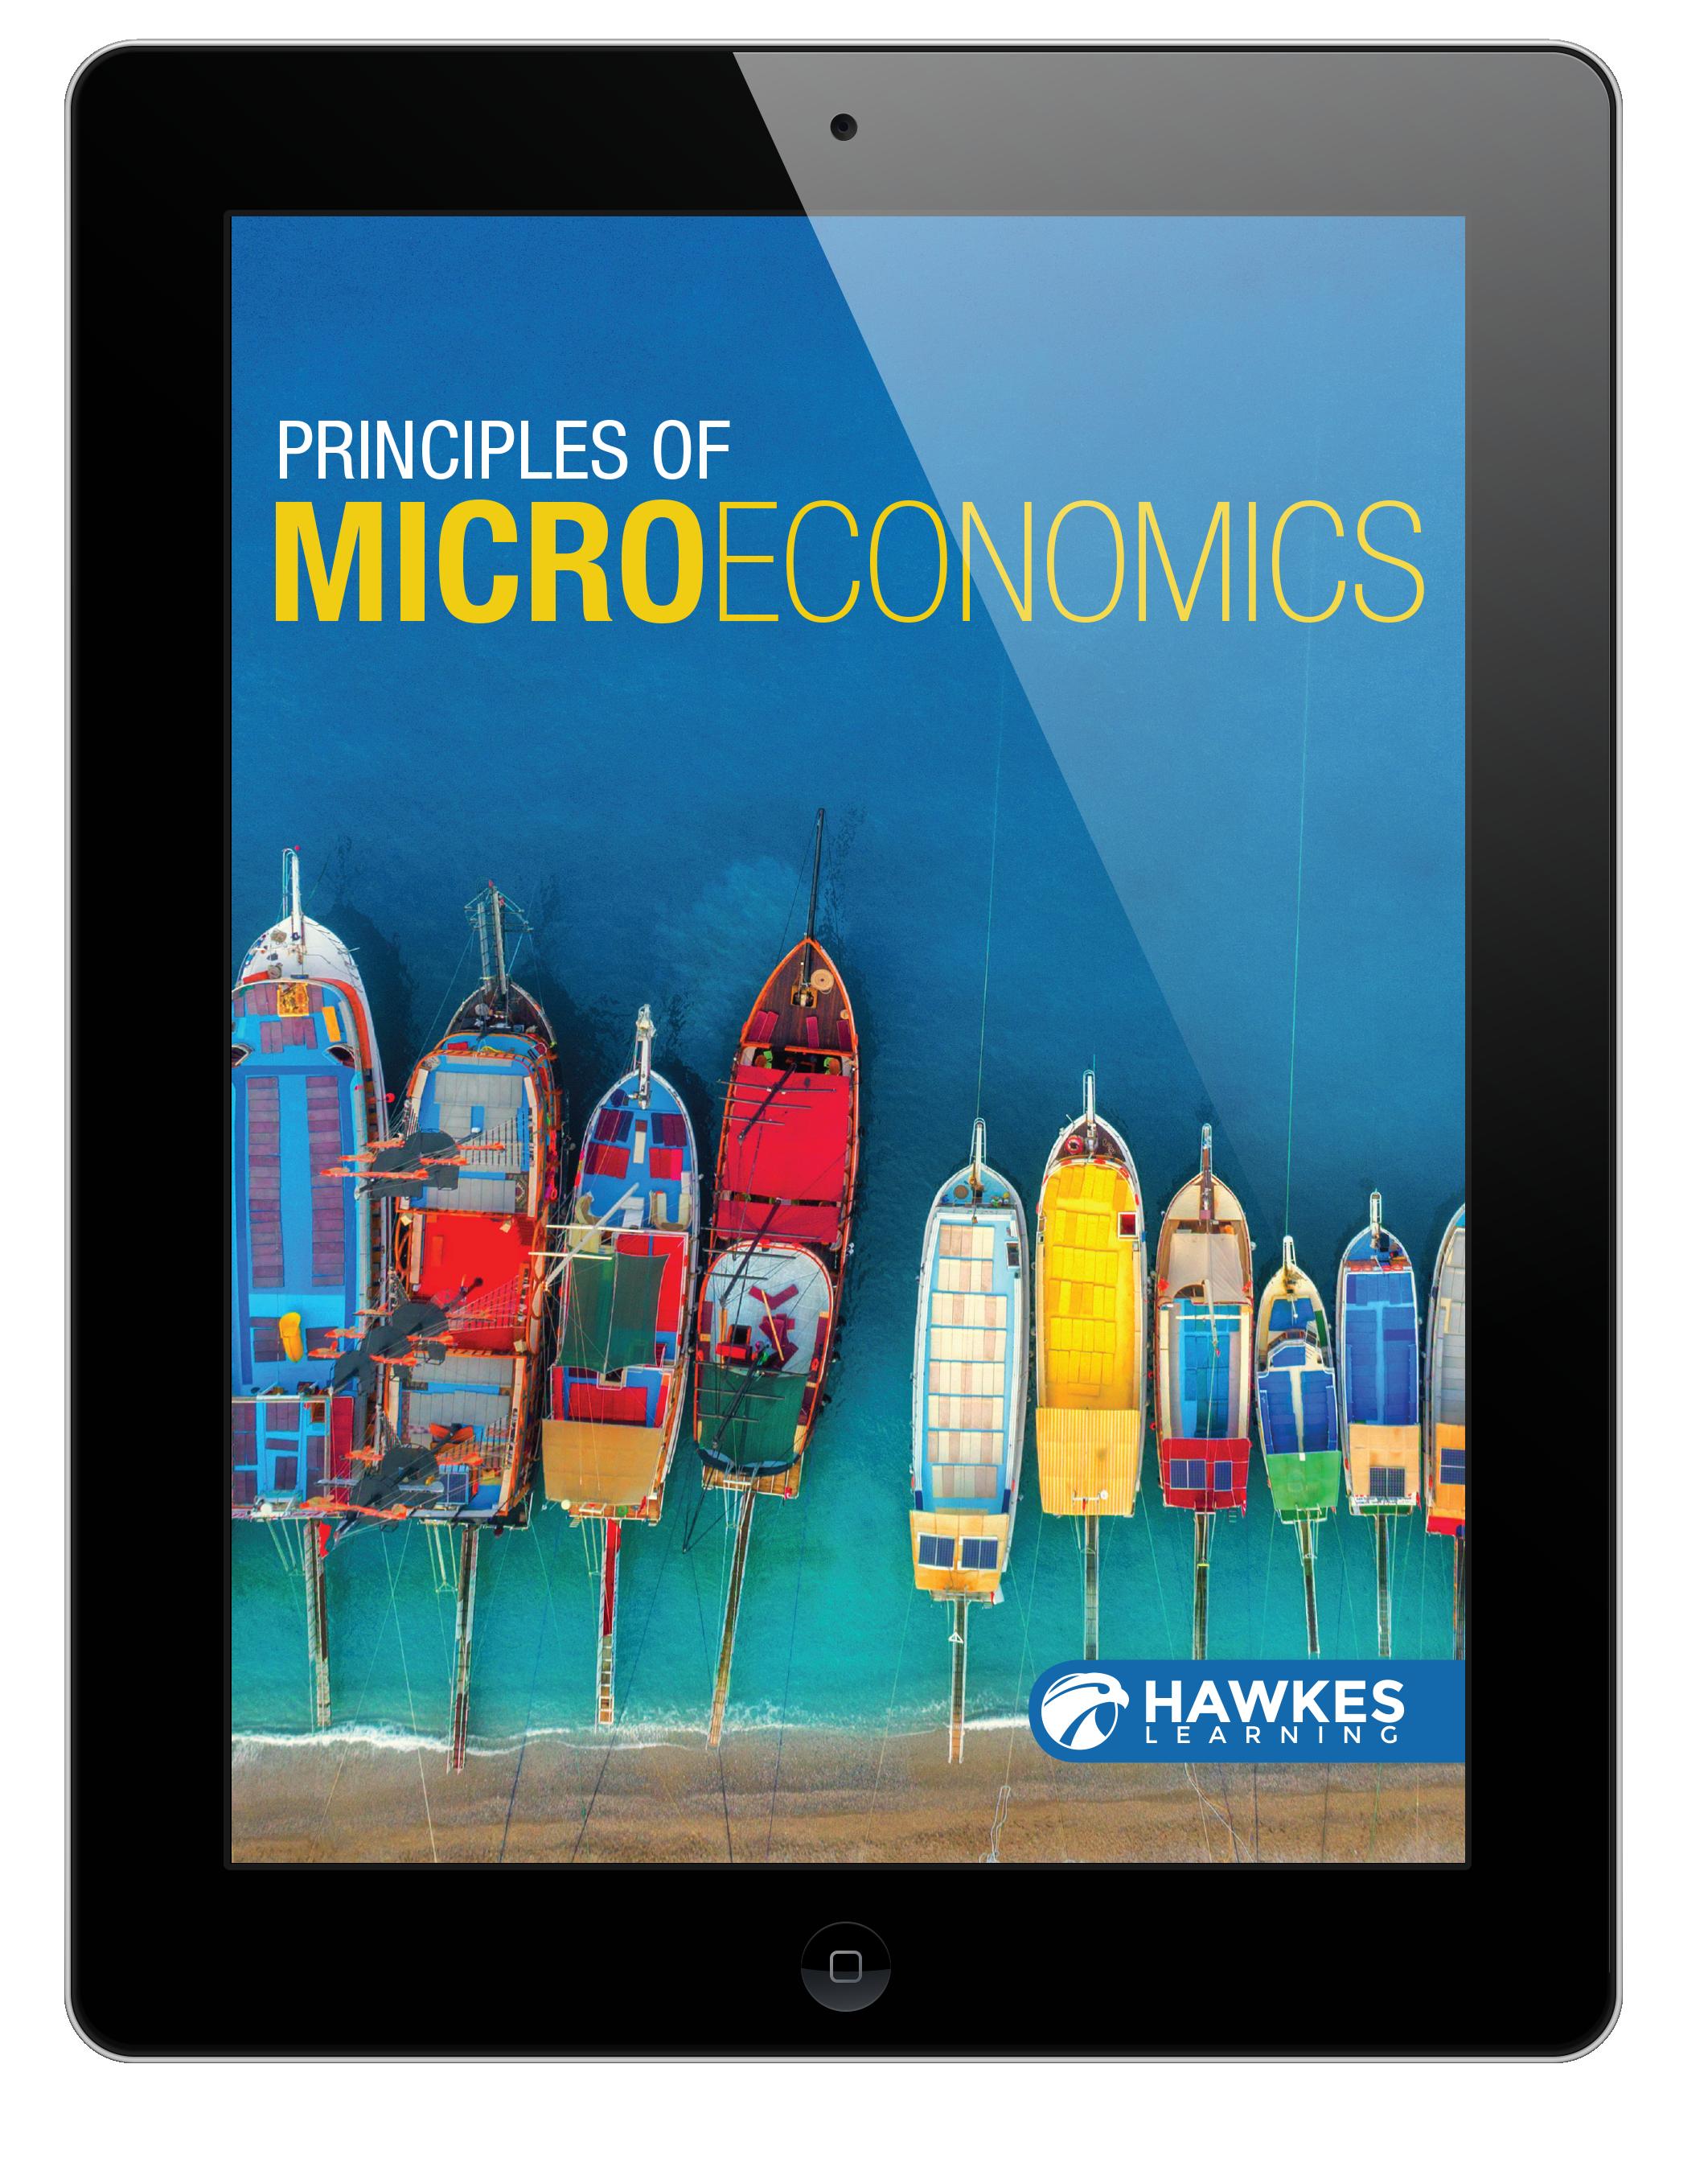 Principles of Microeconomics in iPad